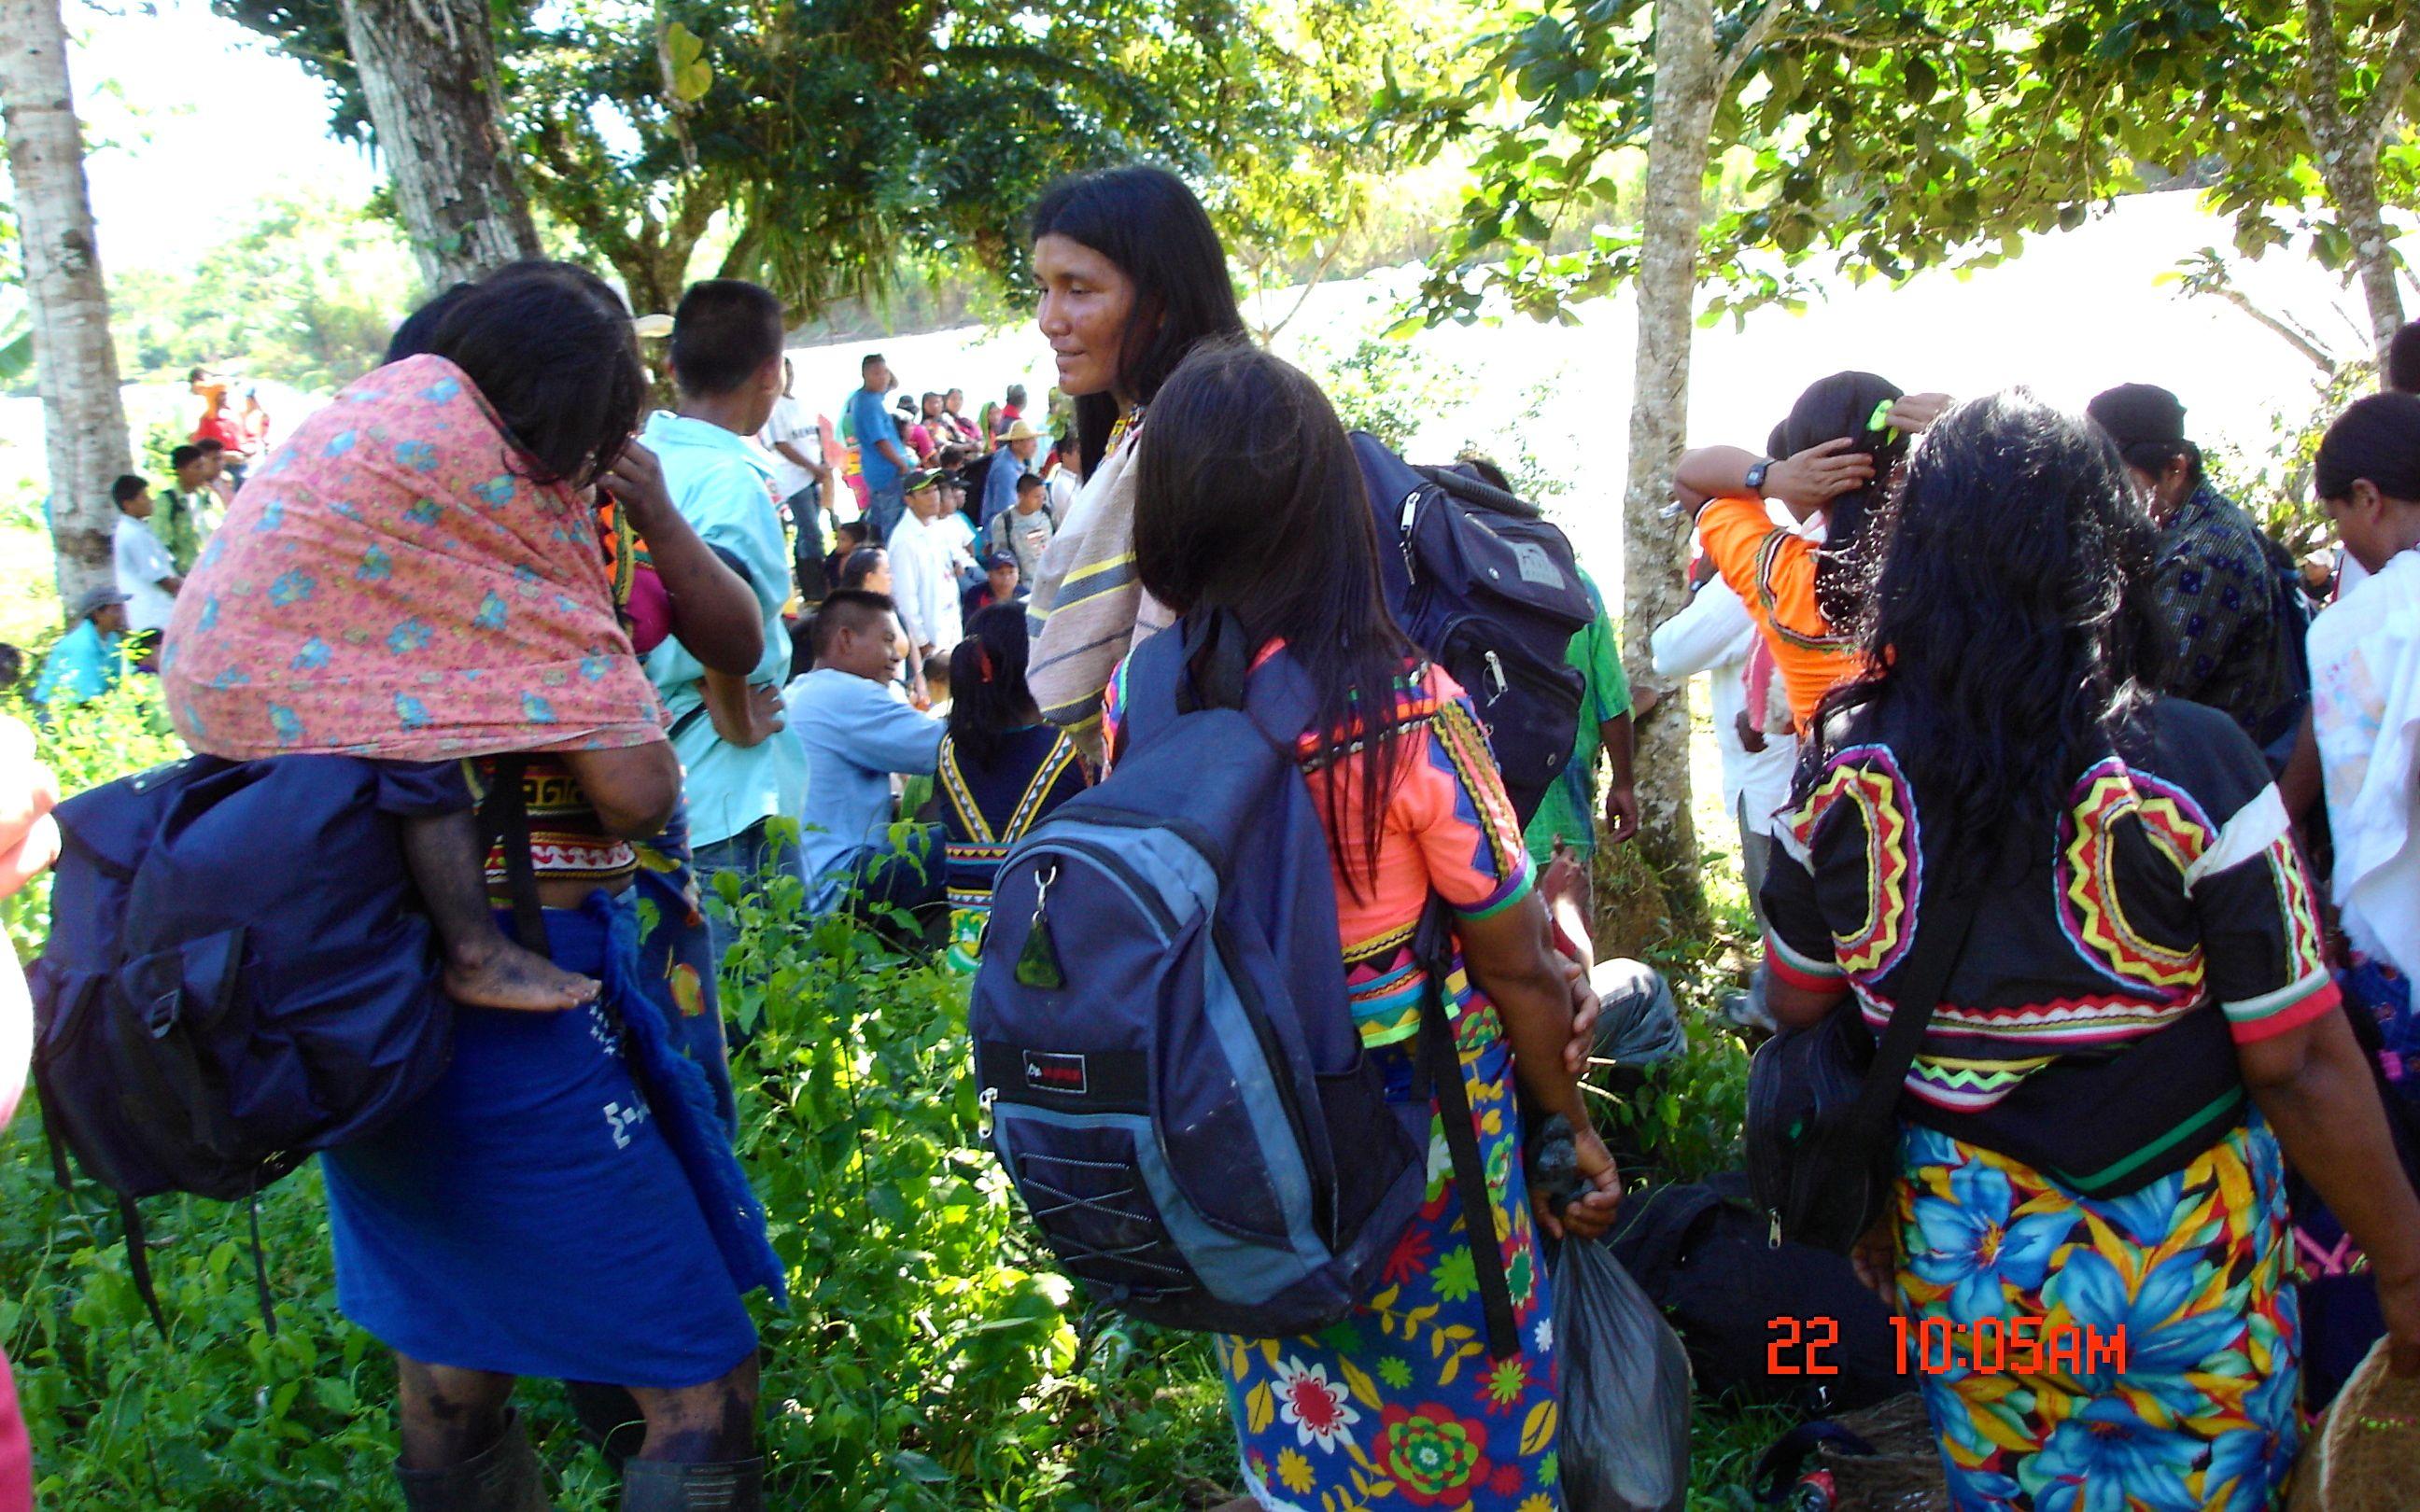 medidas-urgentes-para-proteger-embera-katio-de-cordoba-solicita-defensoria